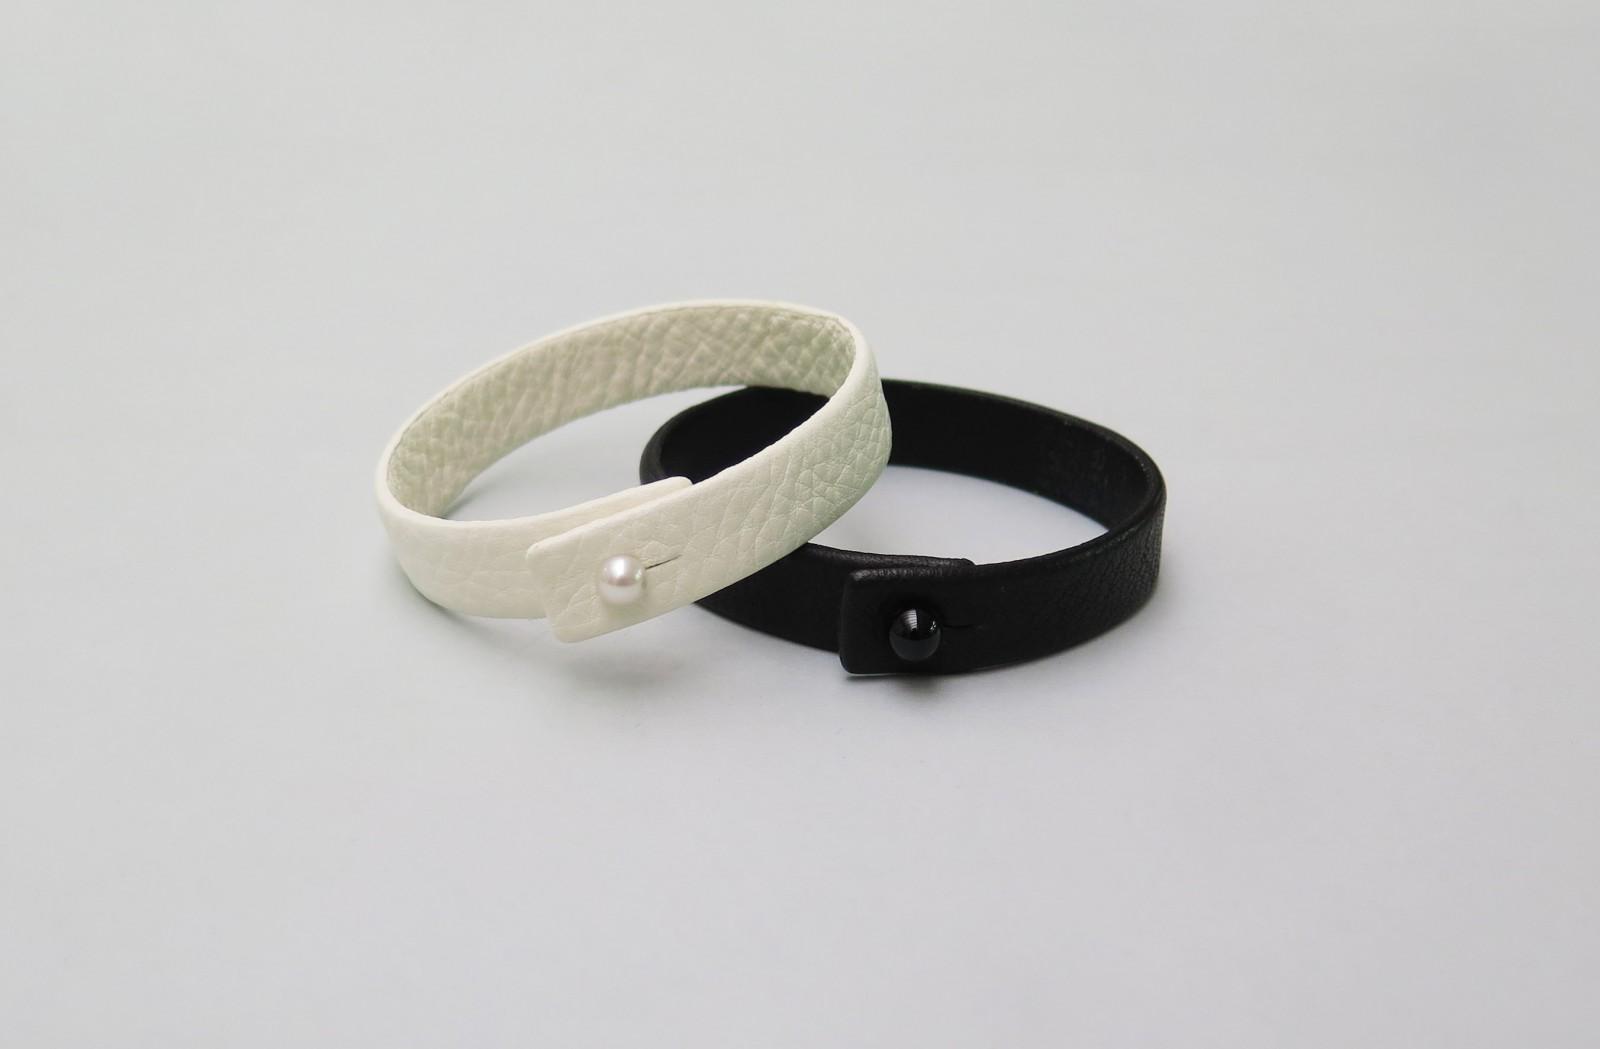 Leather Bracelet No1 183 Saskia Diez